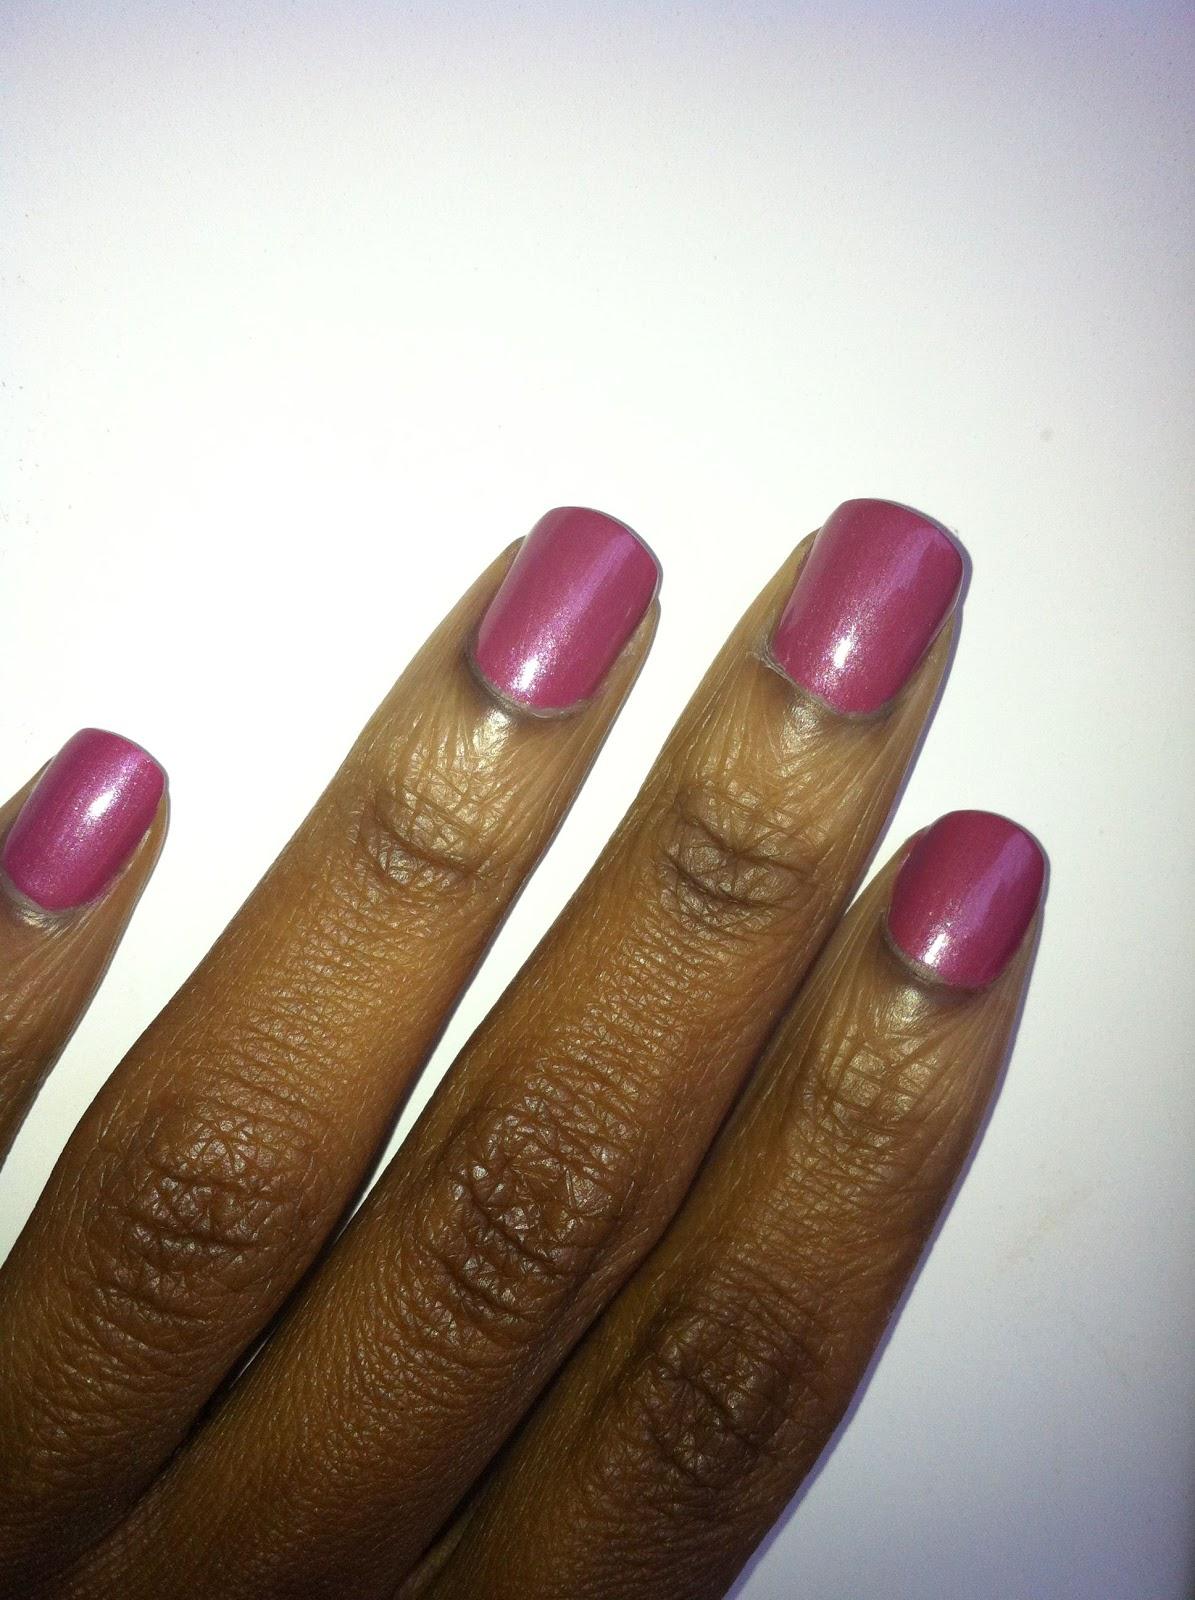 Revlon nail polish iced mauve